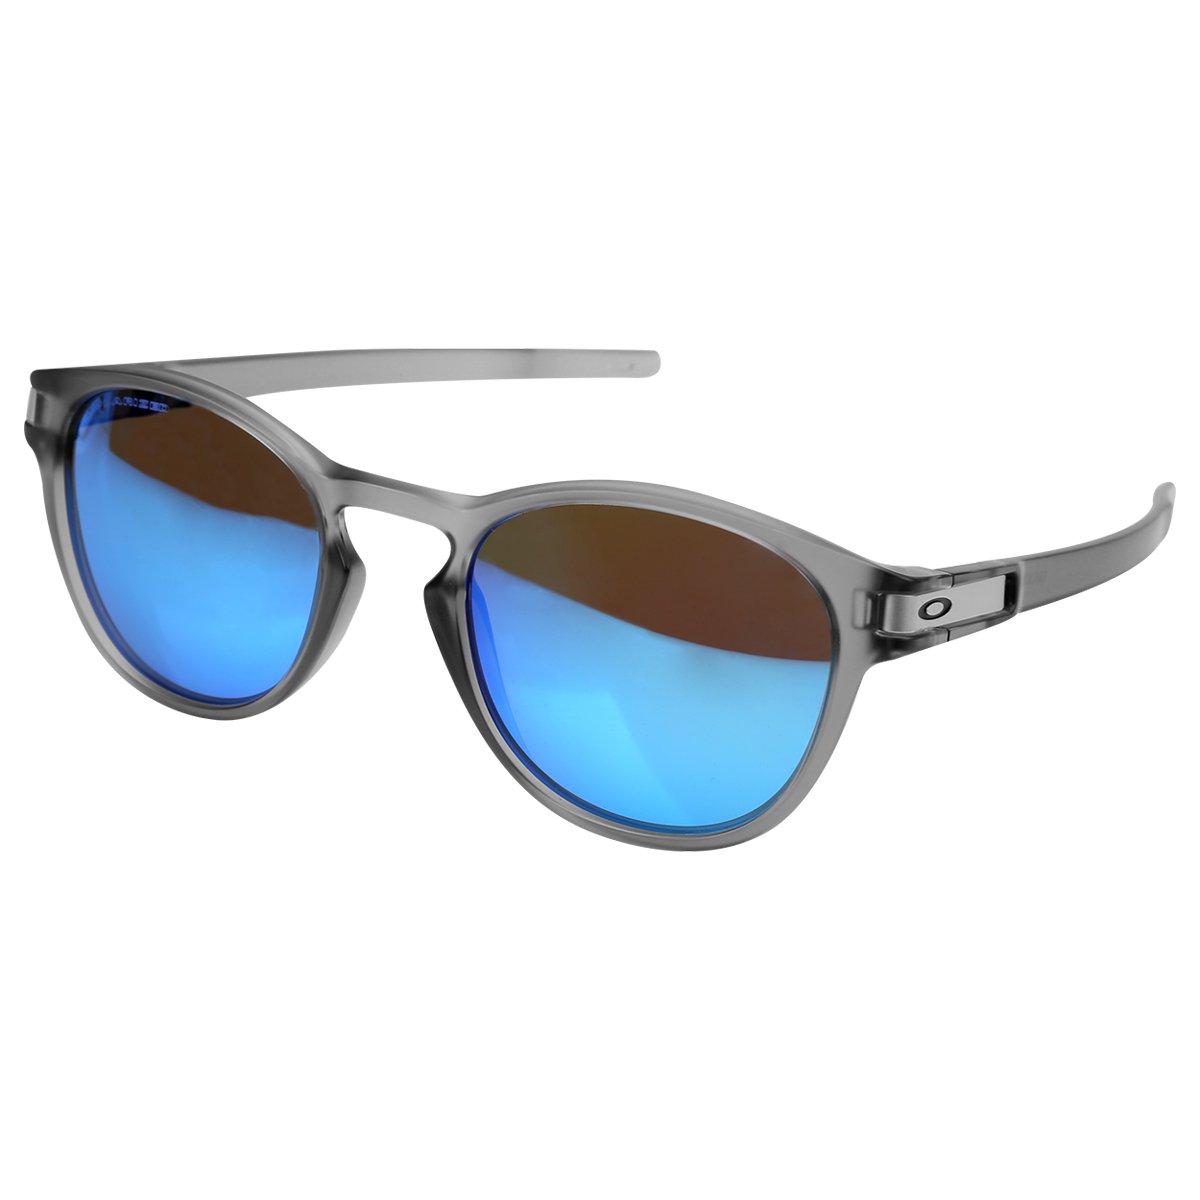 Óculos de Sol de Sol Oakley Latch Masculino - Compre Agora   Netshoes d1447bdd4d